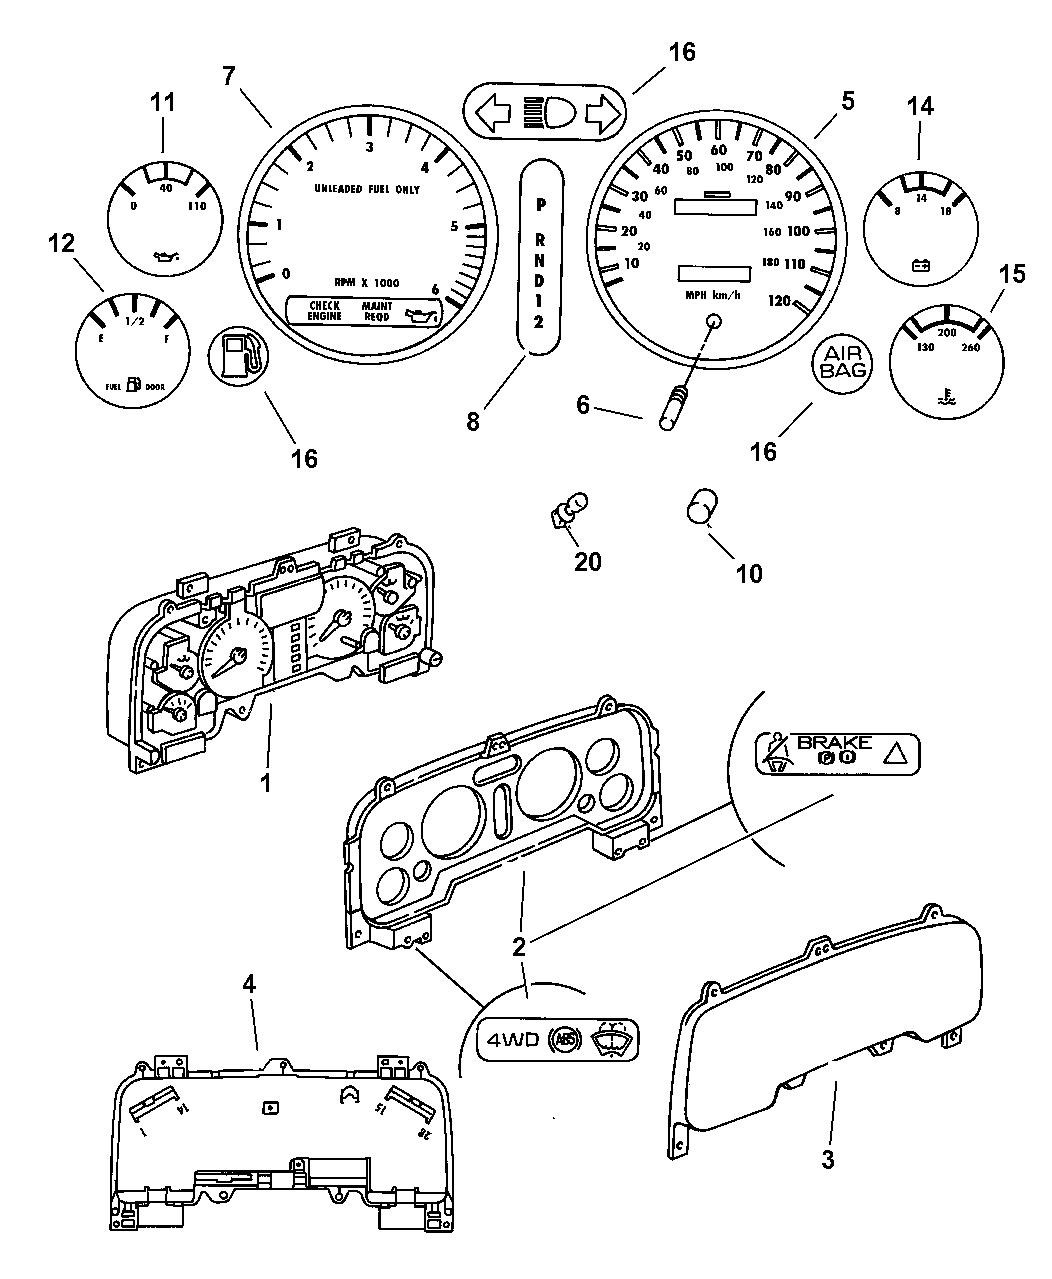 1997 Dodge Ram 1500 Instrument Cluster